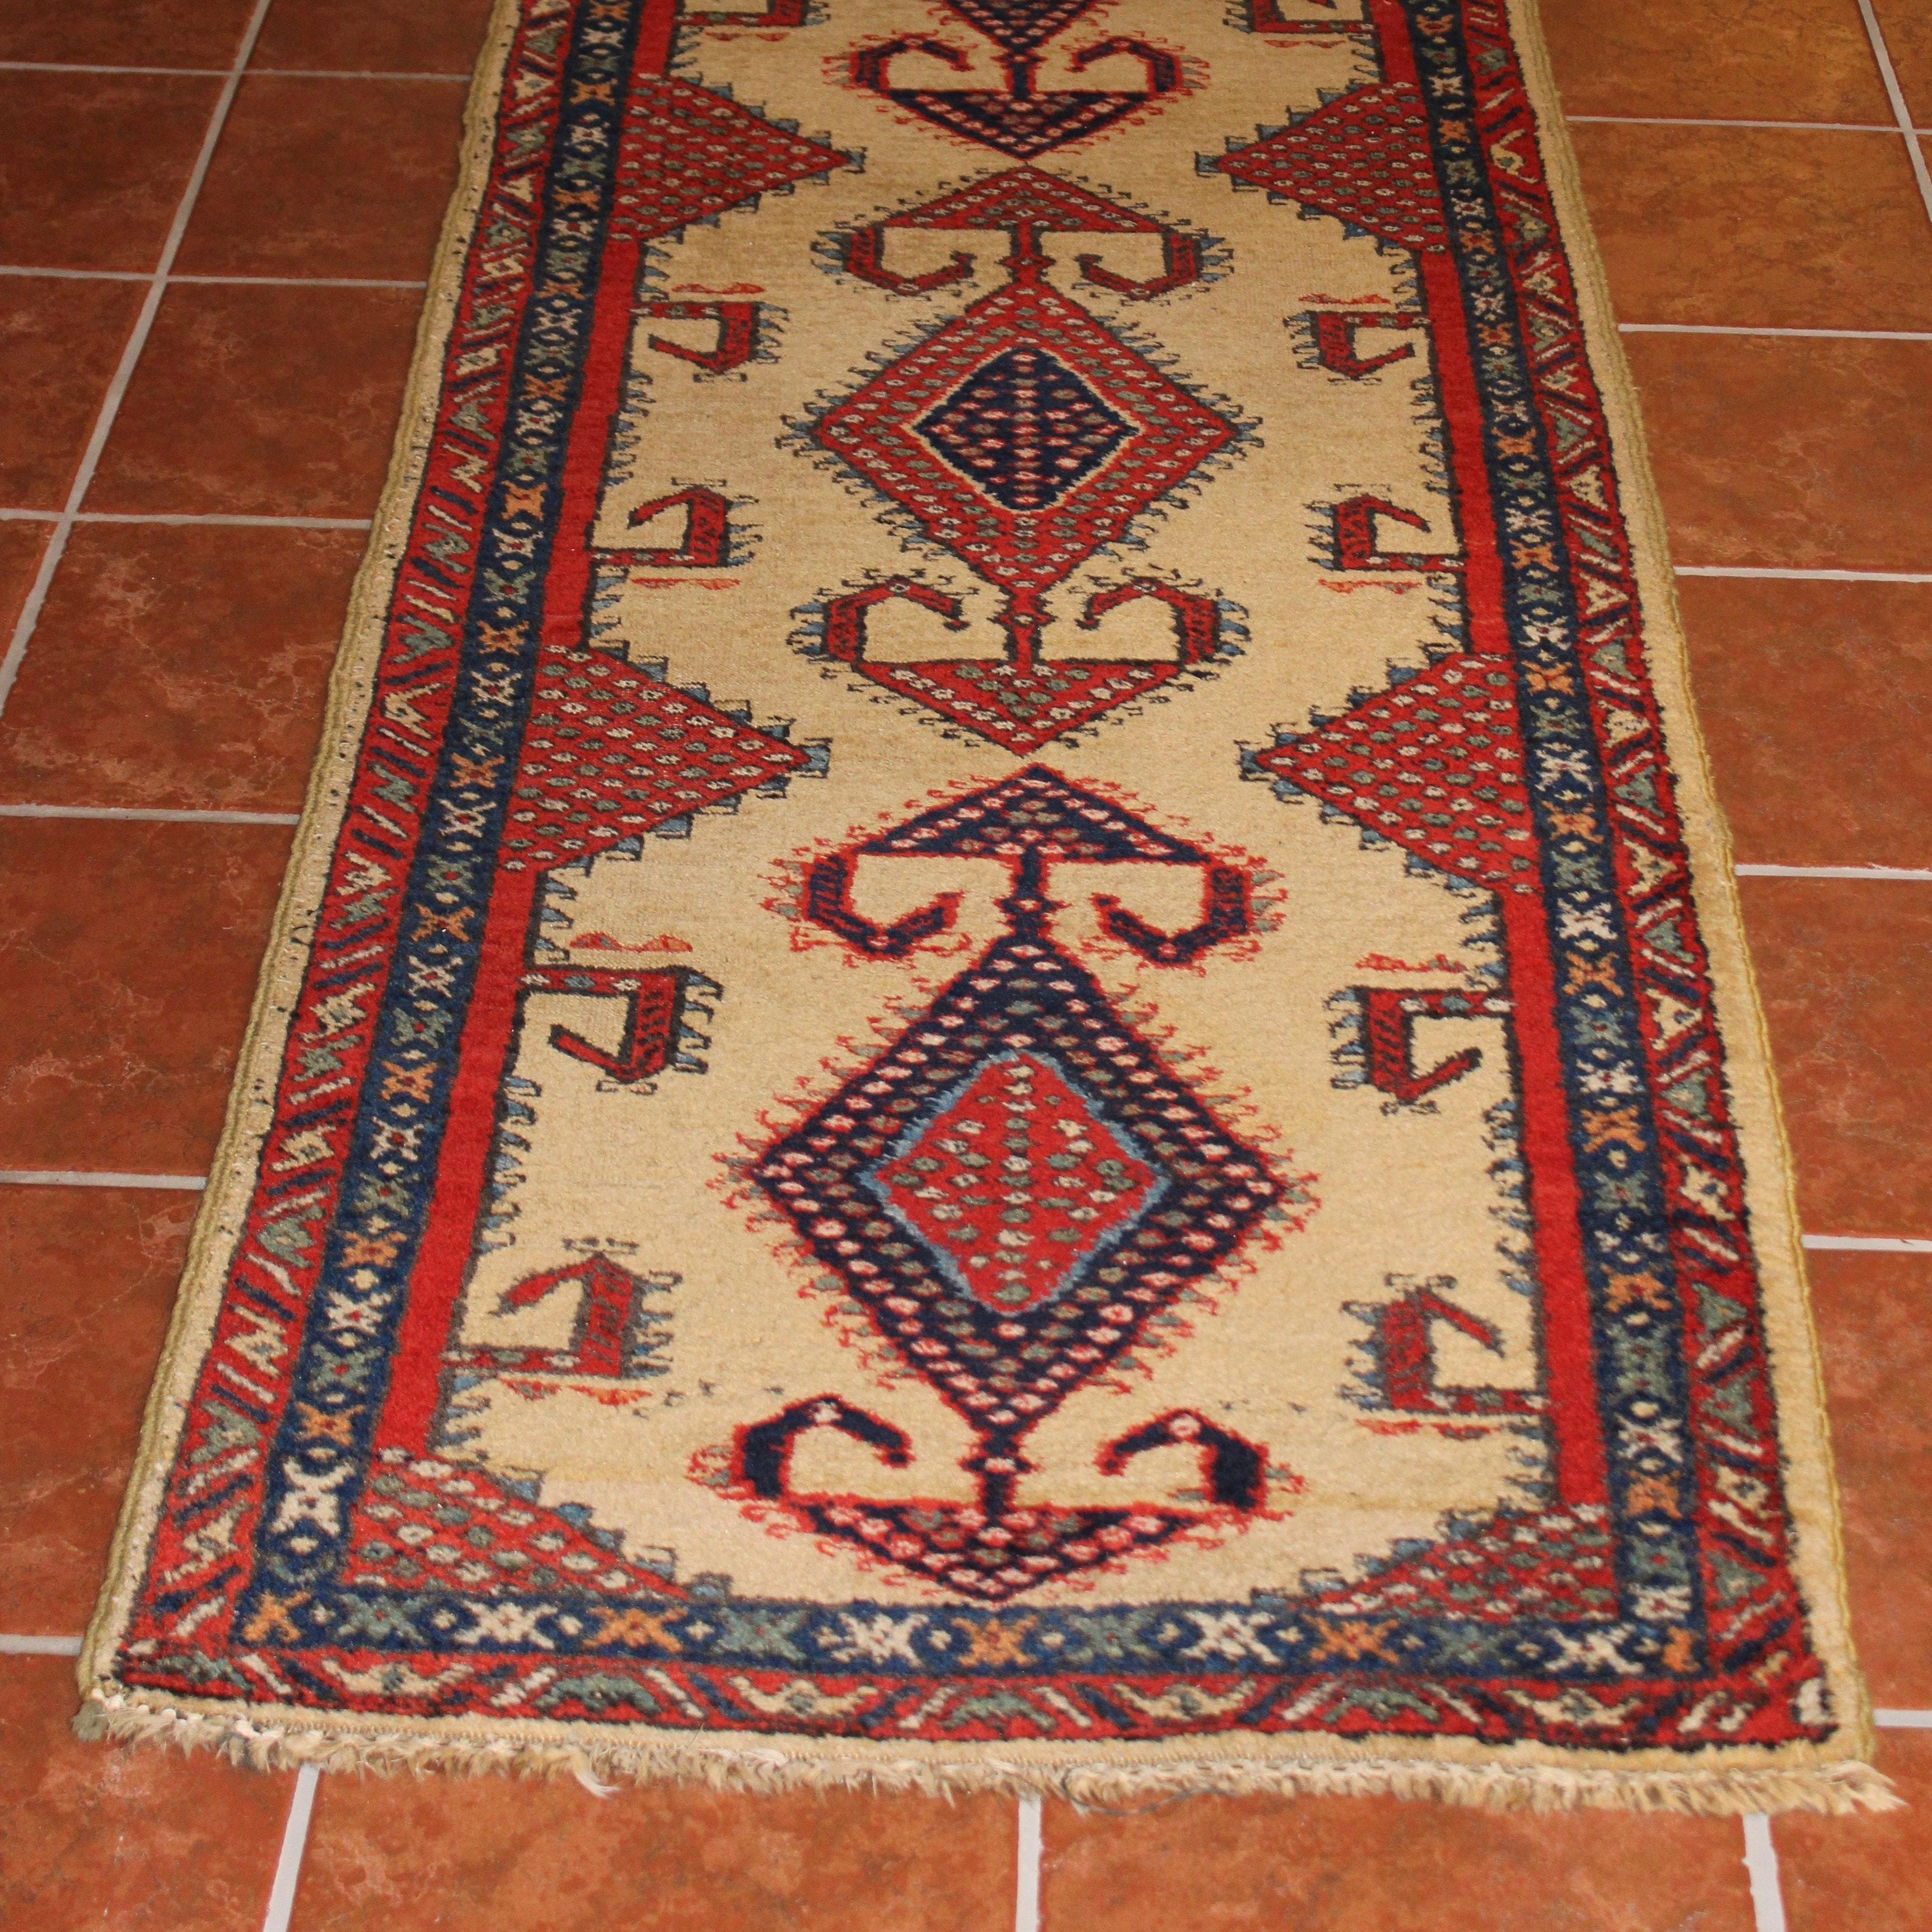 Hand-Woven Turkish Kilim Wool Runner